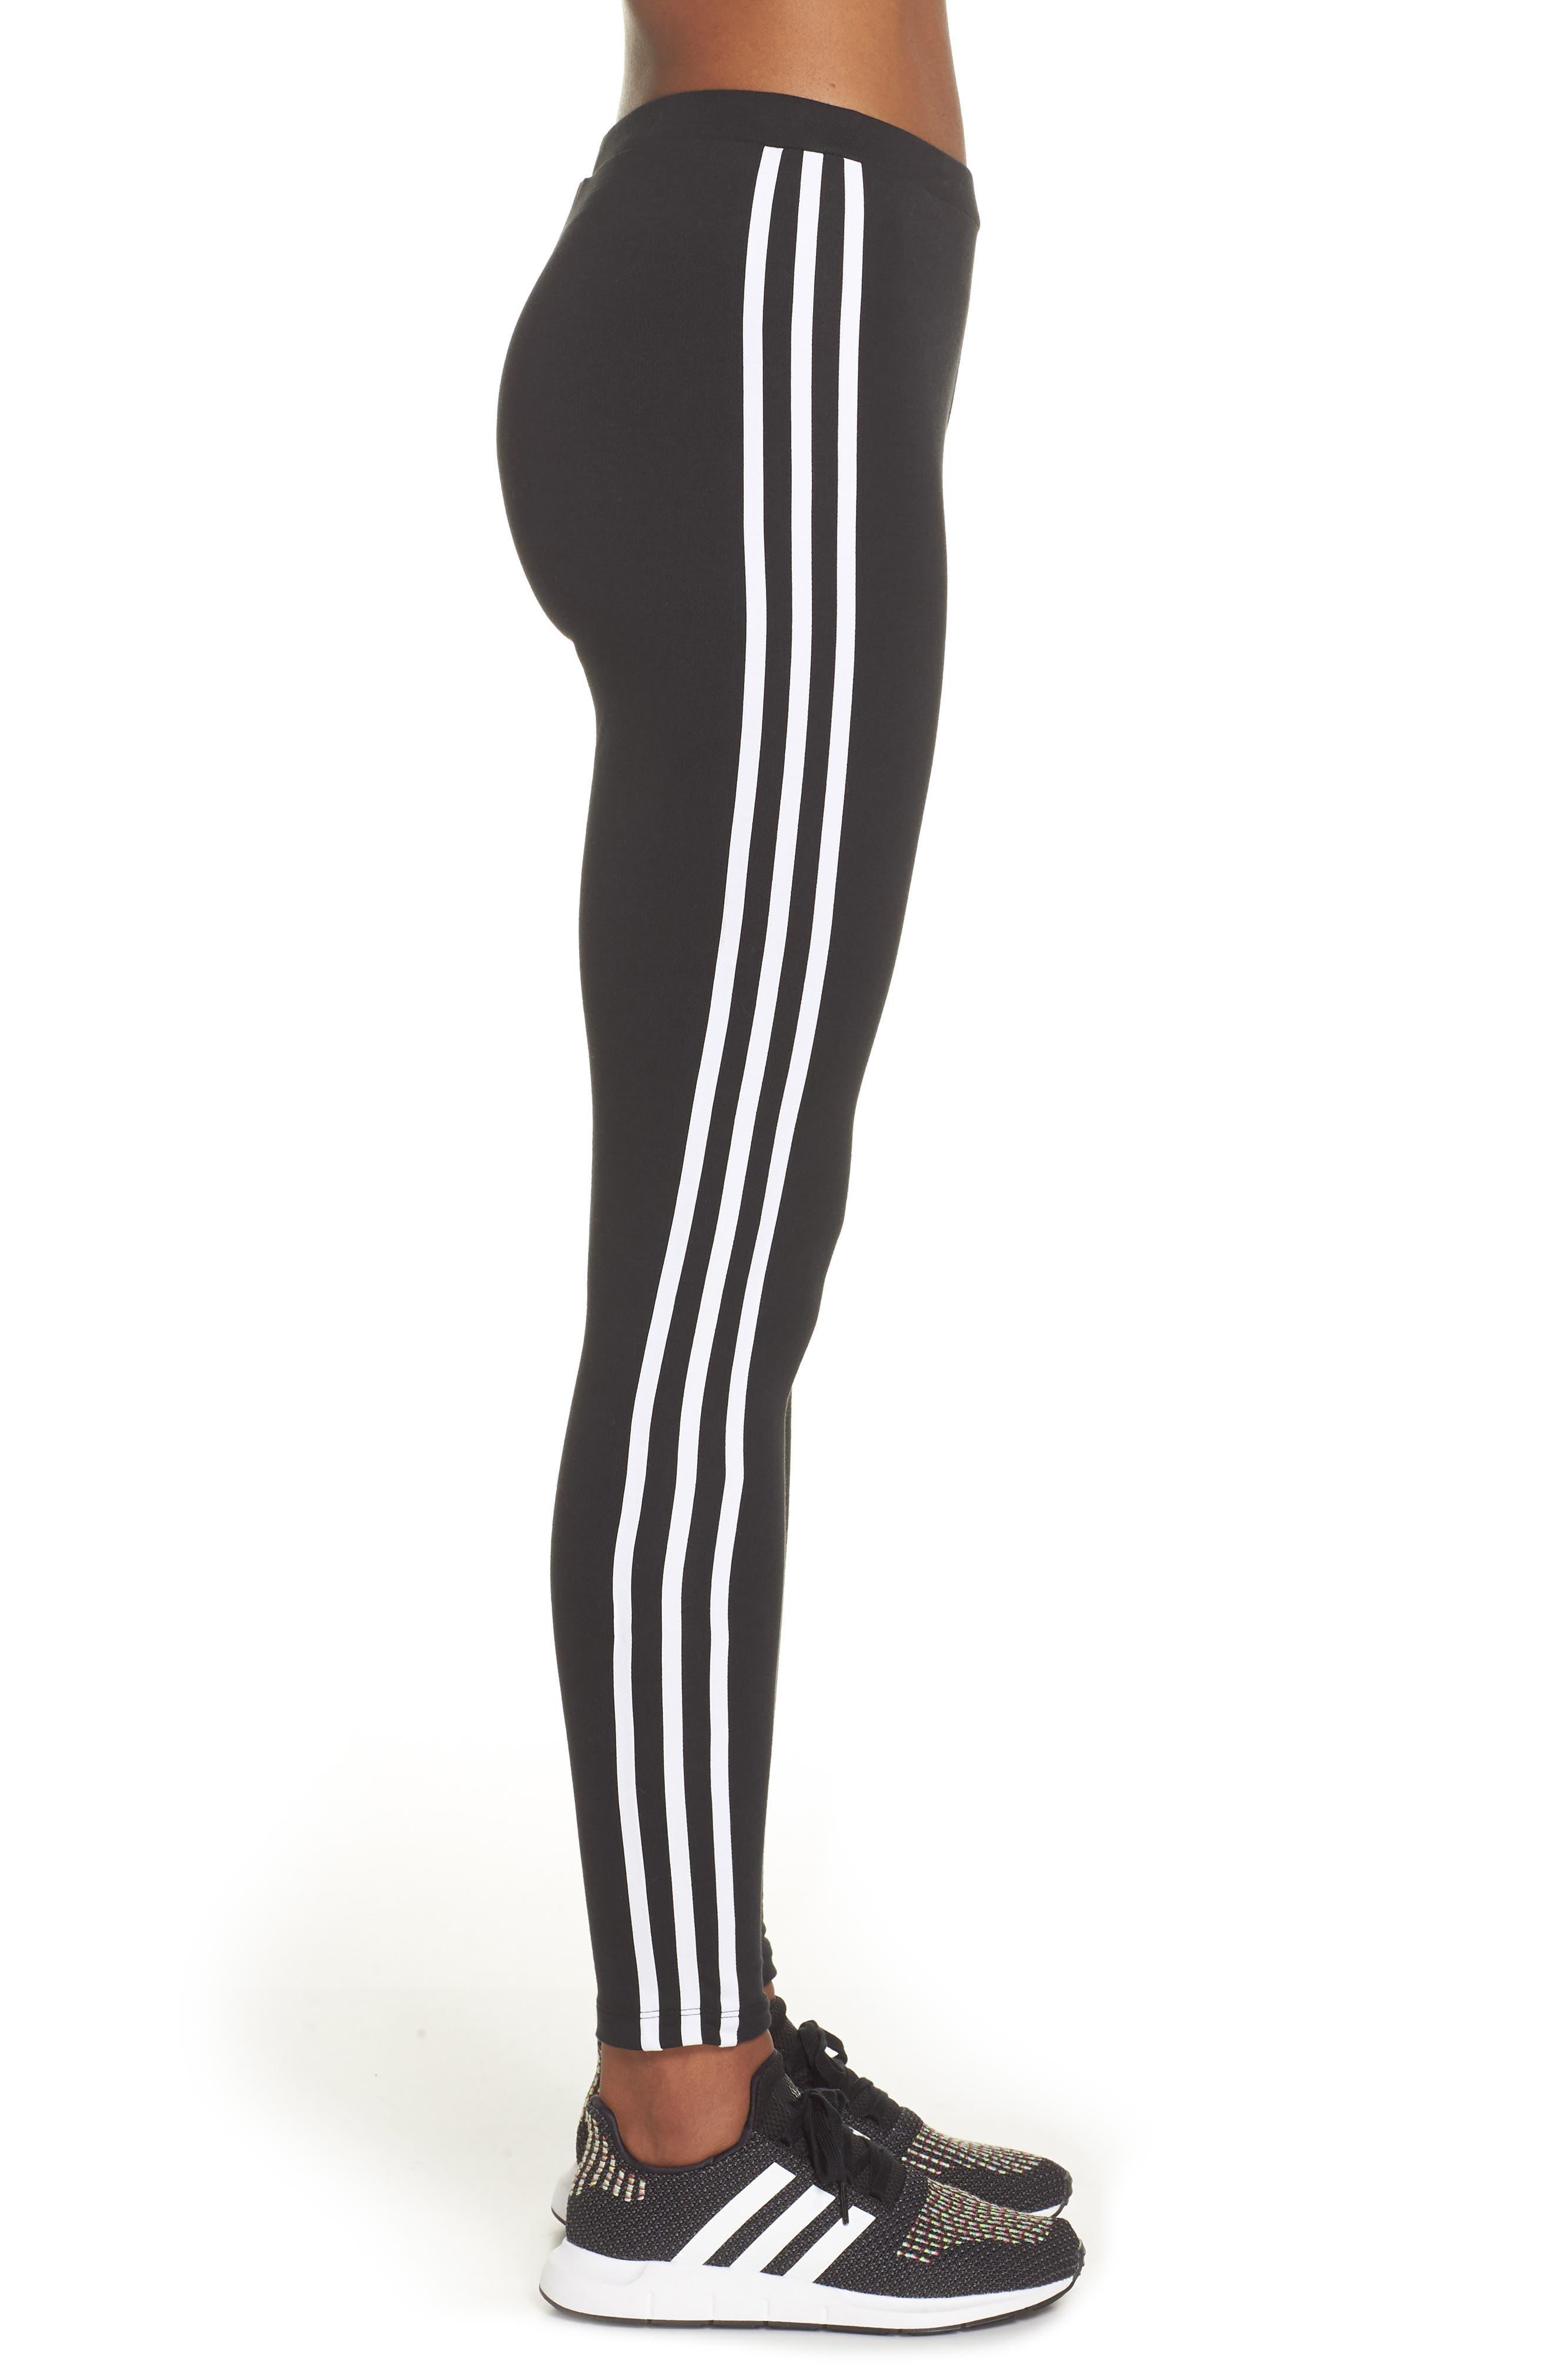 ADIDAS ORIGINALS, adidas 3-Stripes Tights, Alternate thumbnail 4, color, 001